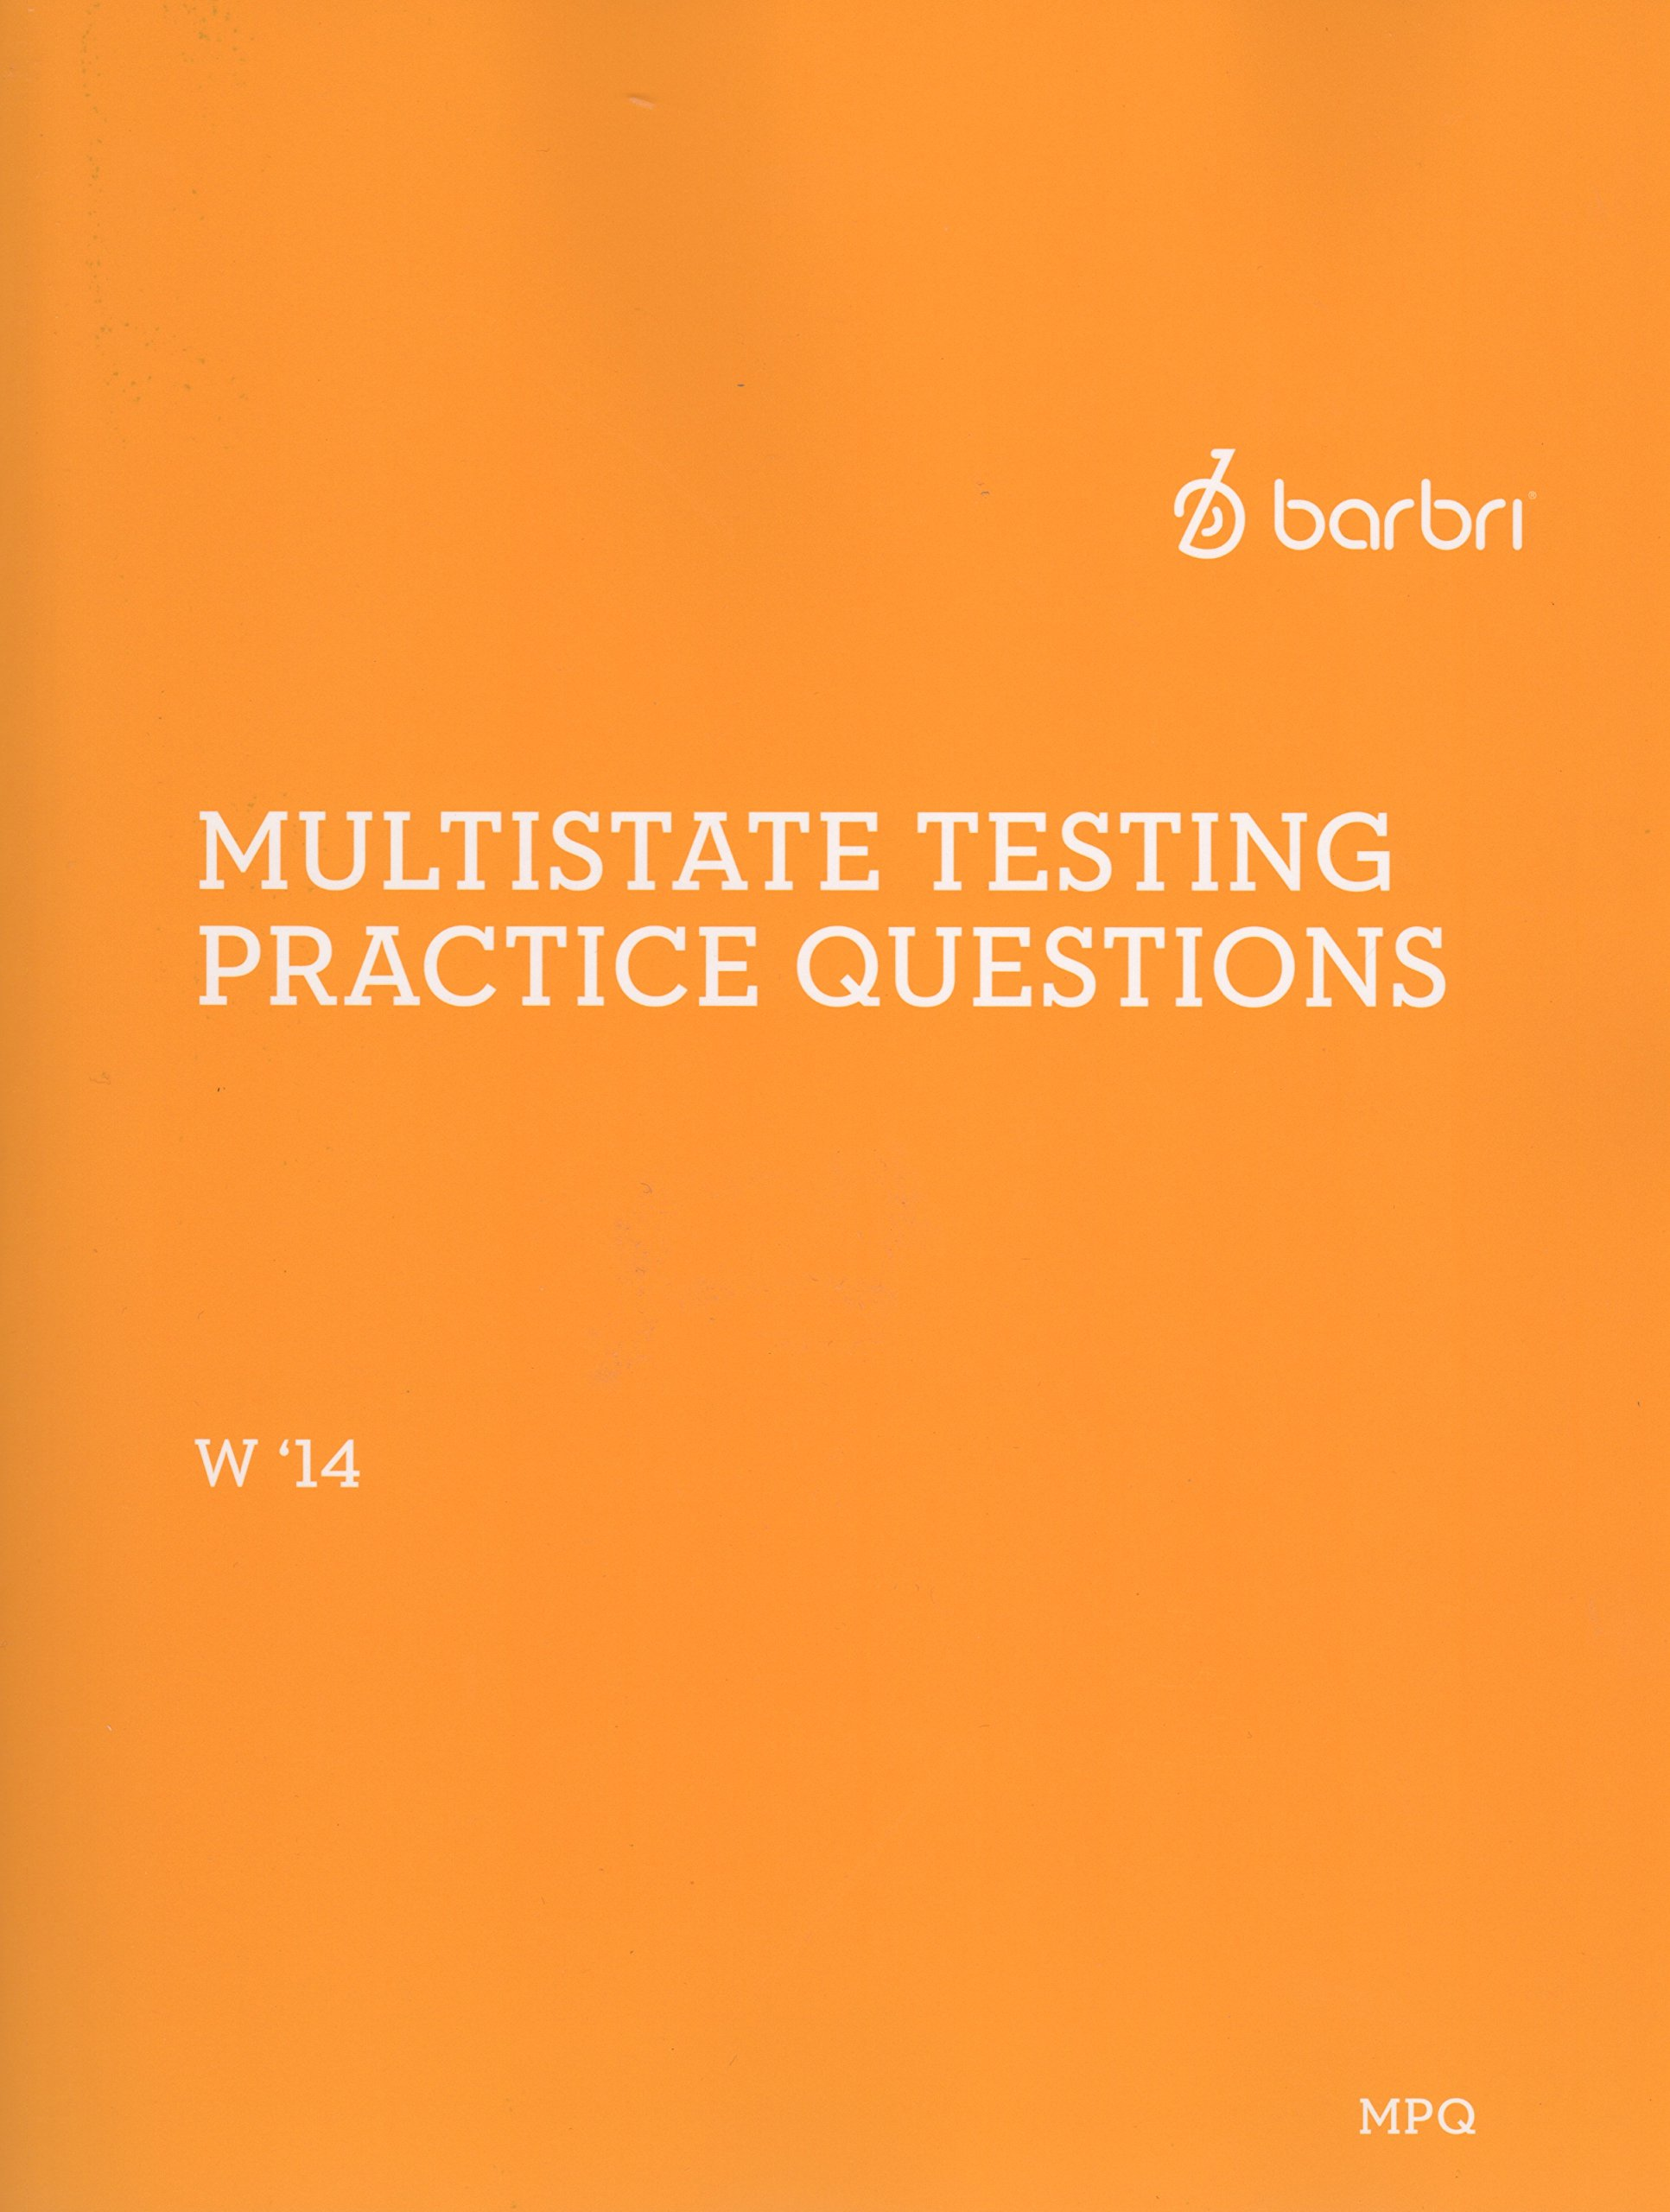 2014 WINTER BARBRI MULTISTATE PRACTICE QUESTIONS INCs 10 CIV